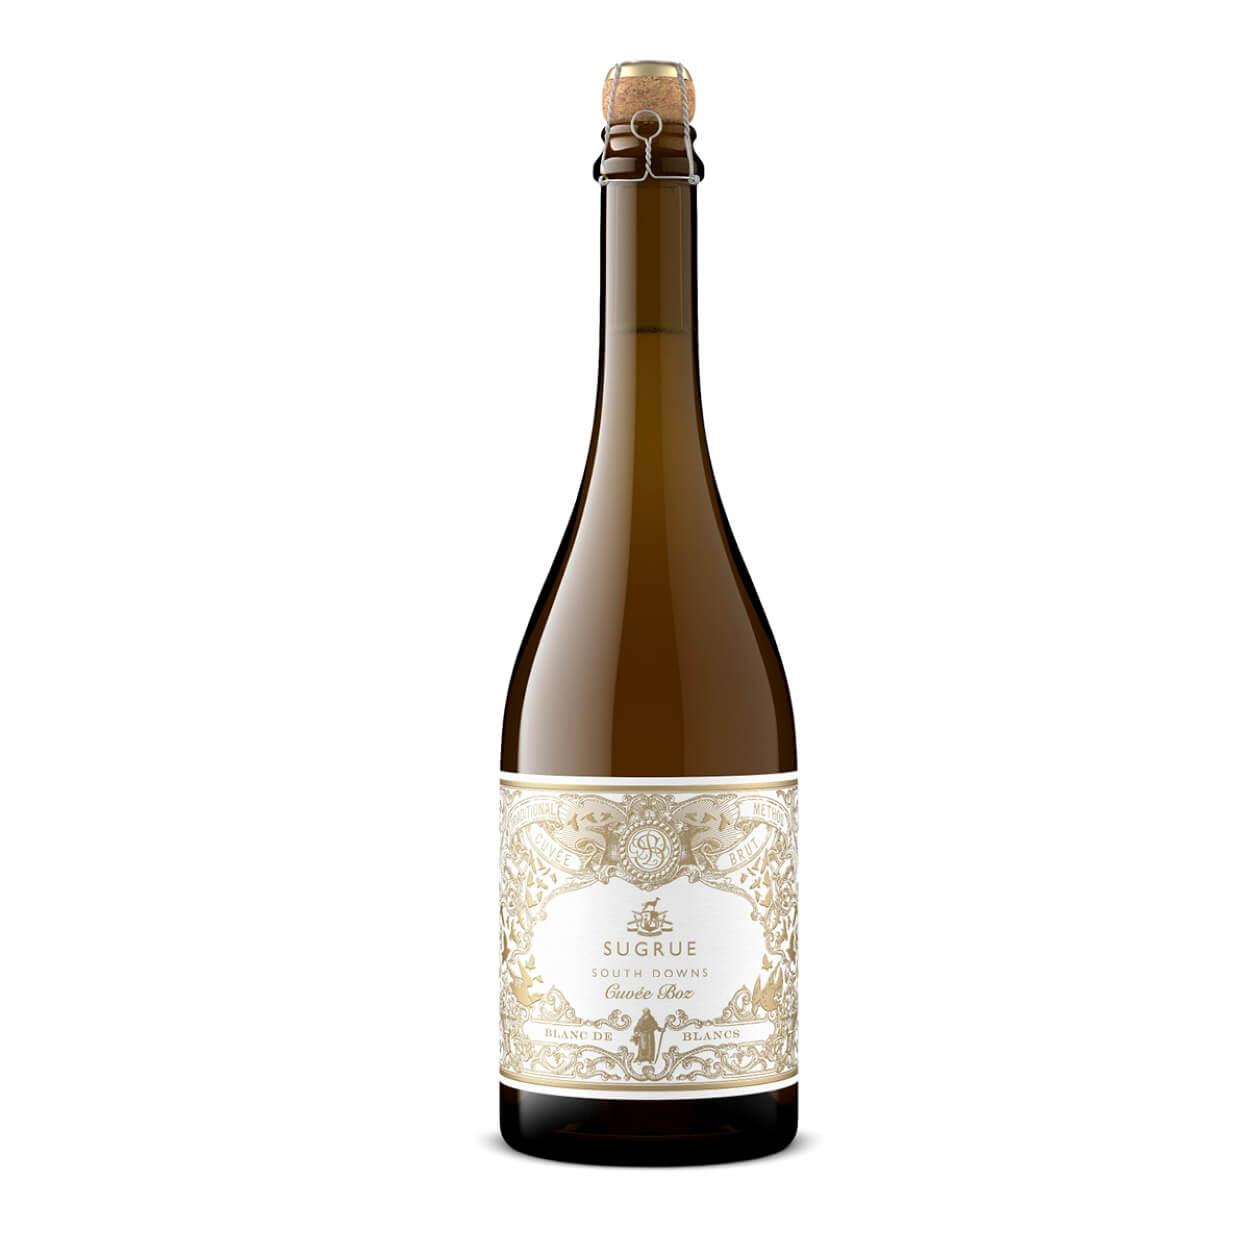 Sugrue South Downs Cuvée Boz Blanc de Blancs 2015 English Sparkling Wine